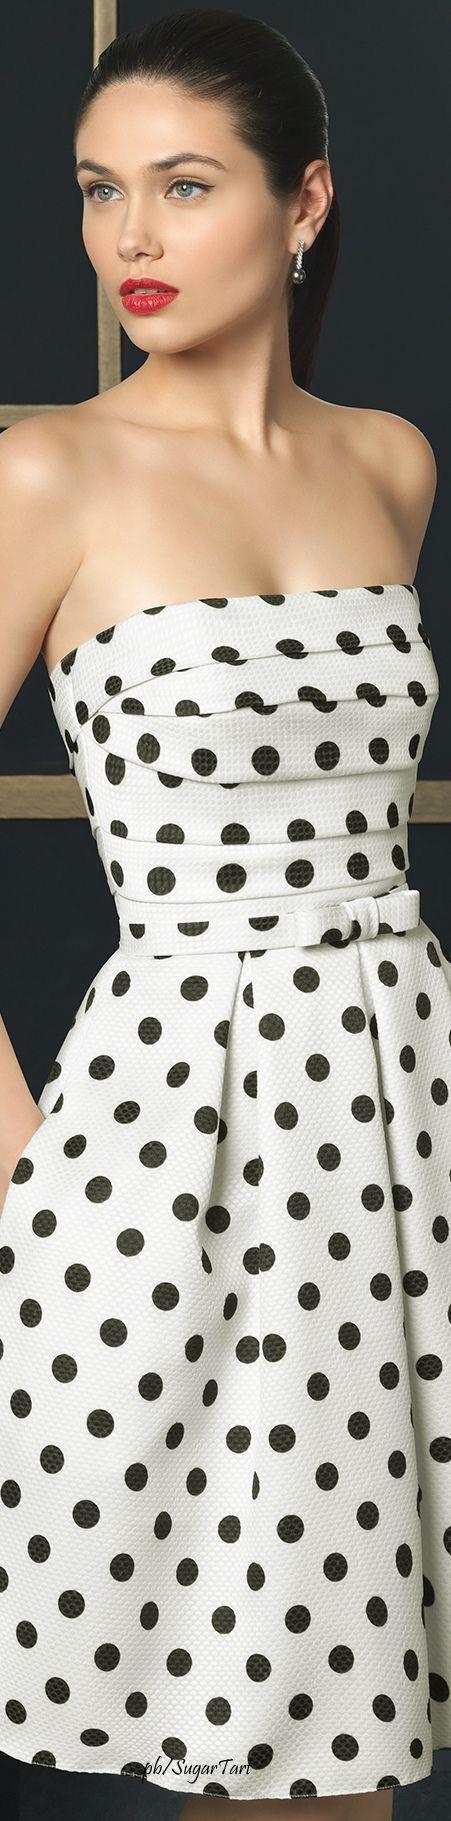 Polka dots dress - see the tiny bow on the waist?